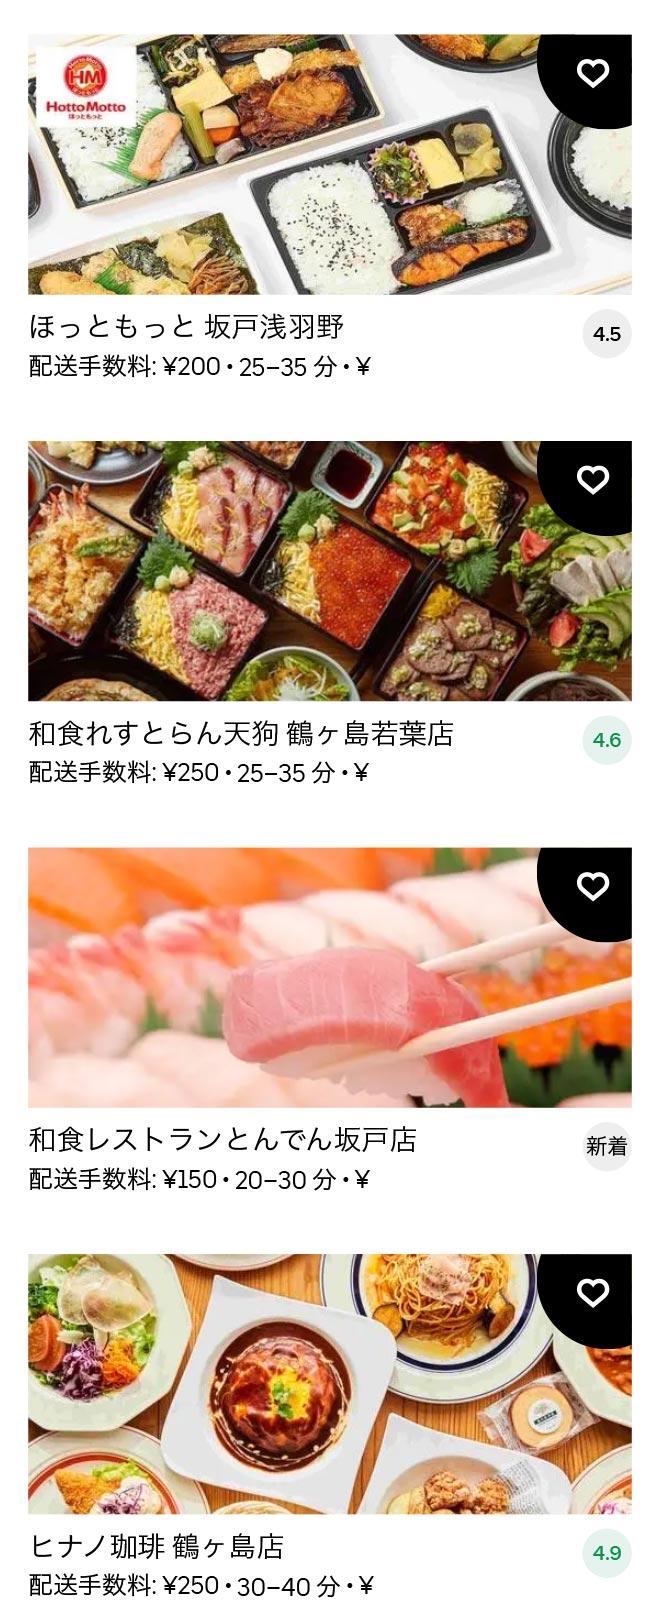 Sakado menu 2101 04